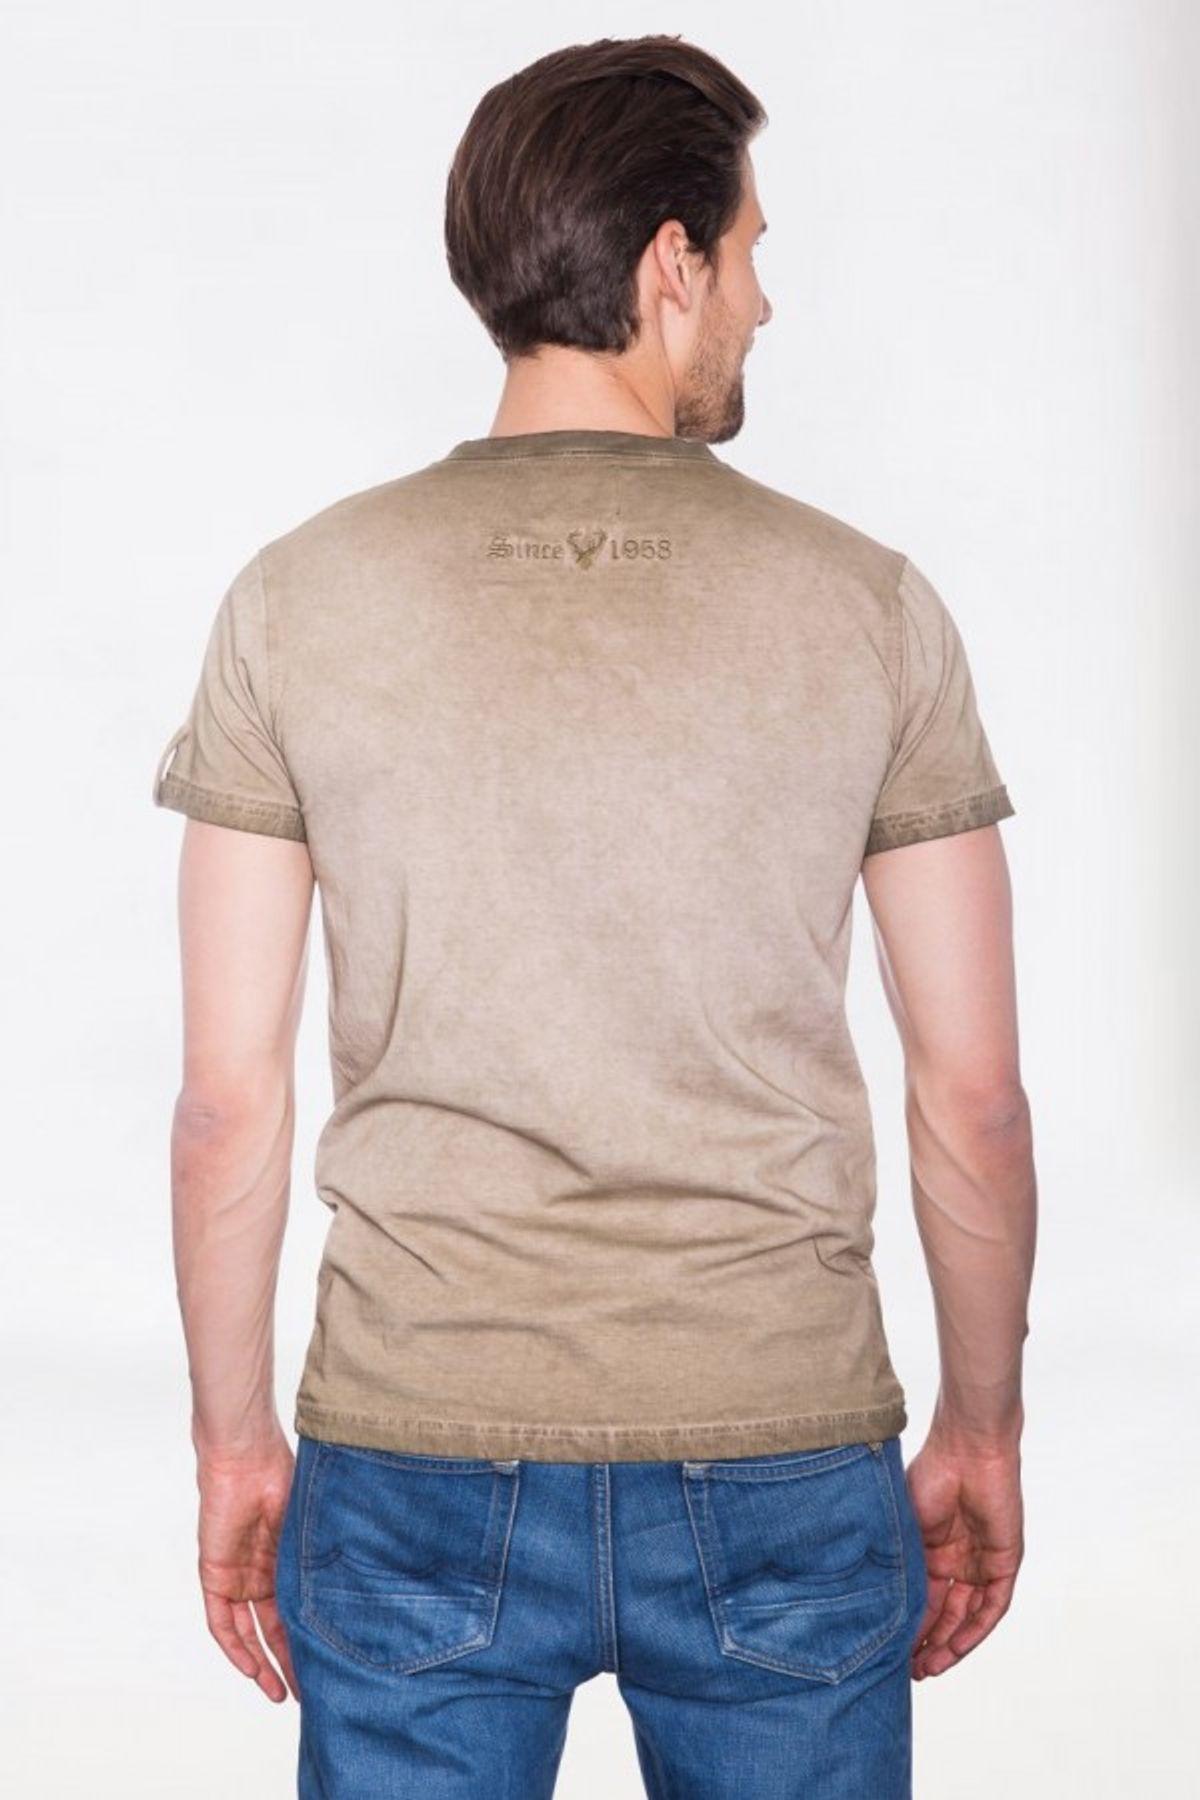 Krüger - Herren Trachten T-Shirt in braun, Seppelhose (91280-7) – Bild 7